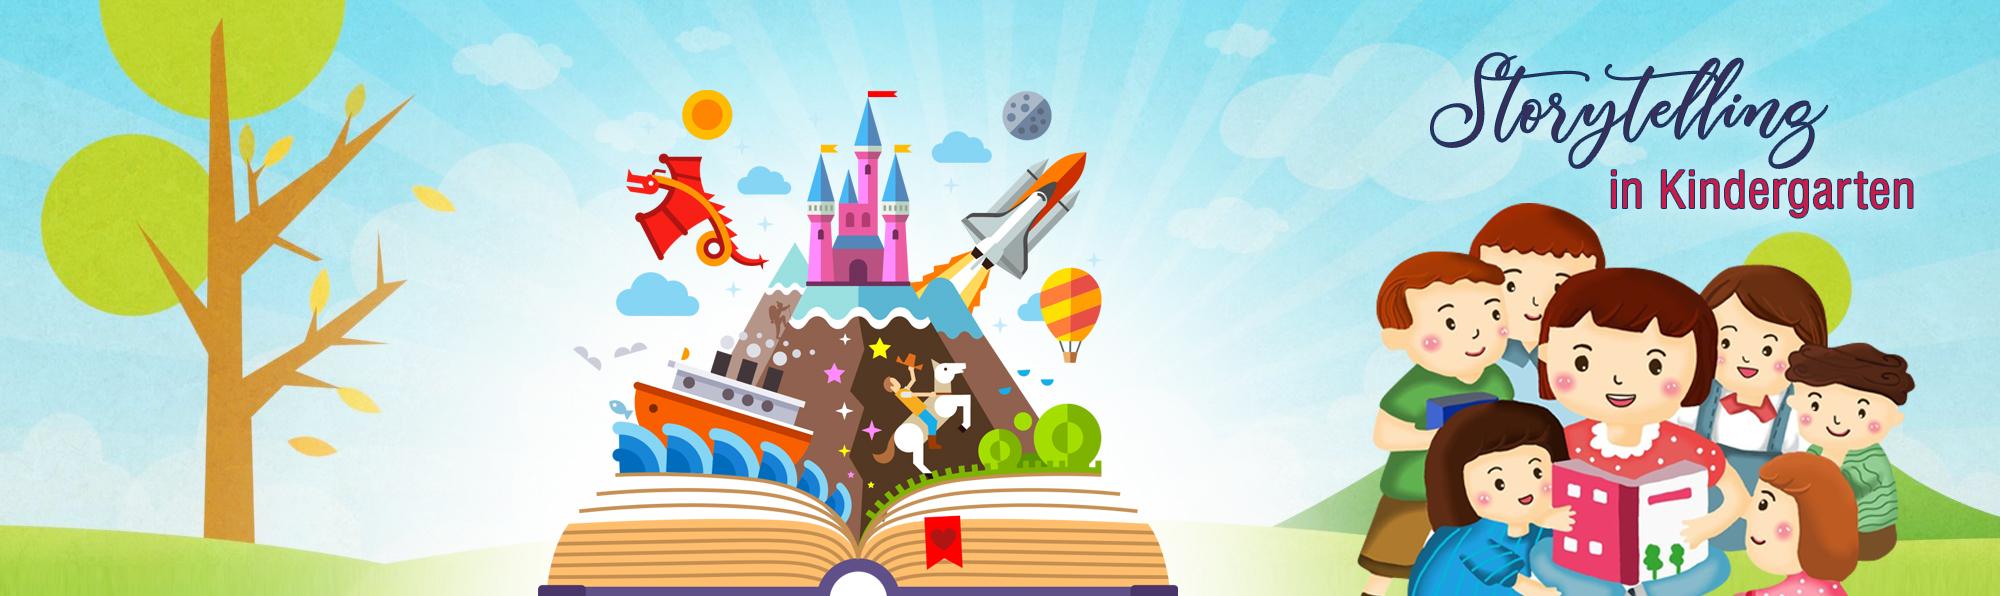 Storytelling in Kindergarten